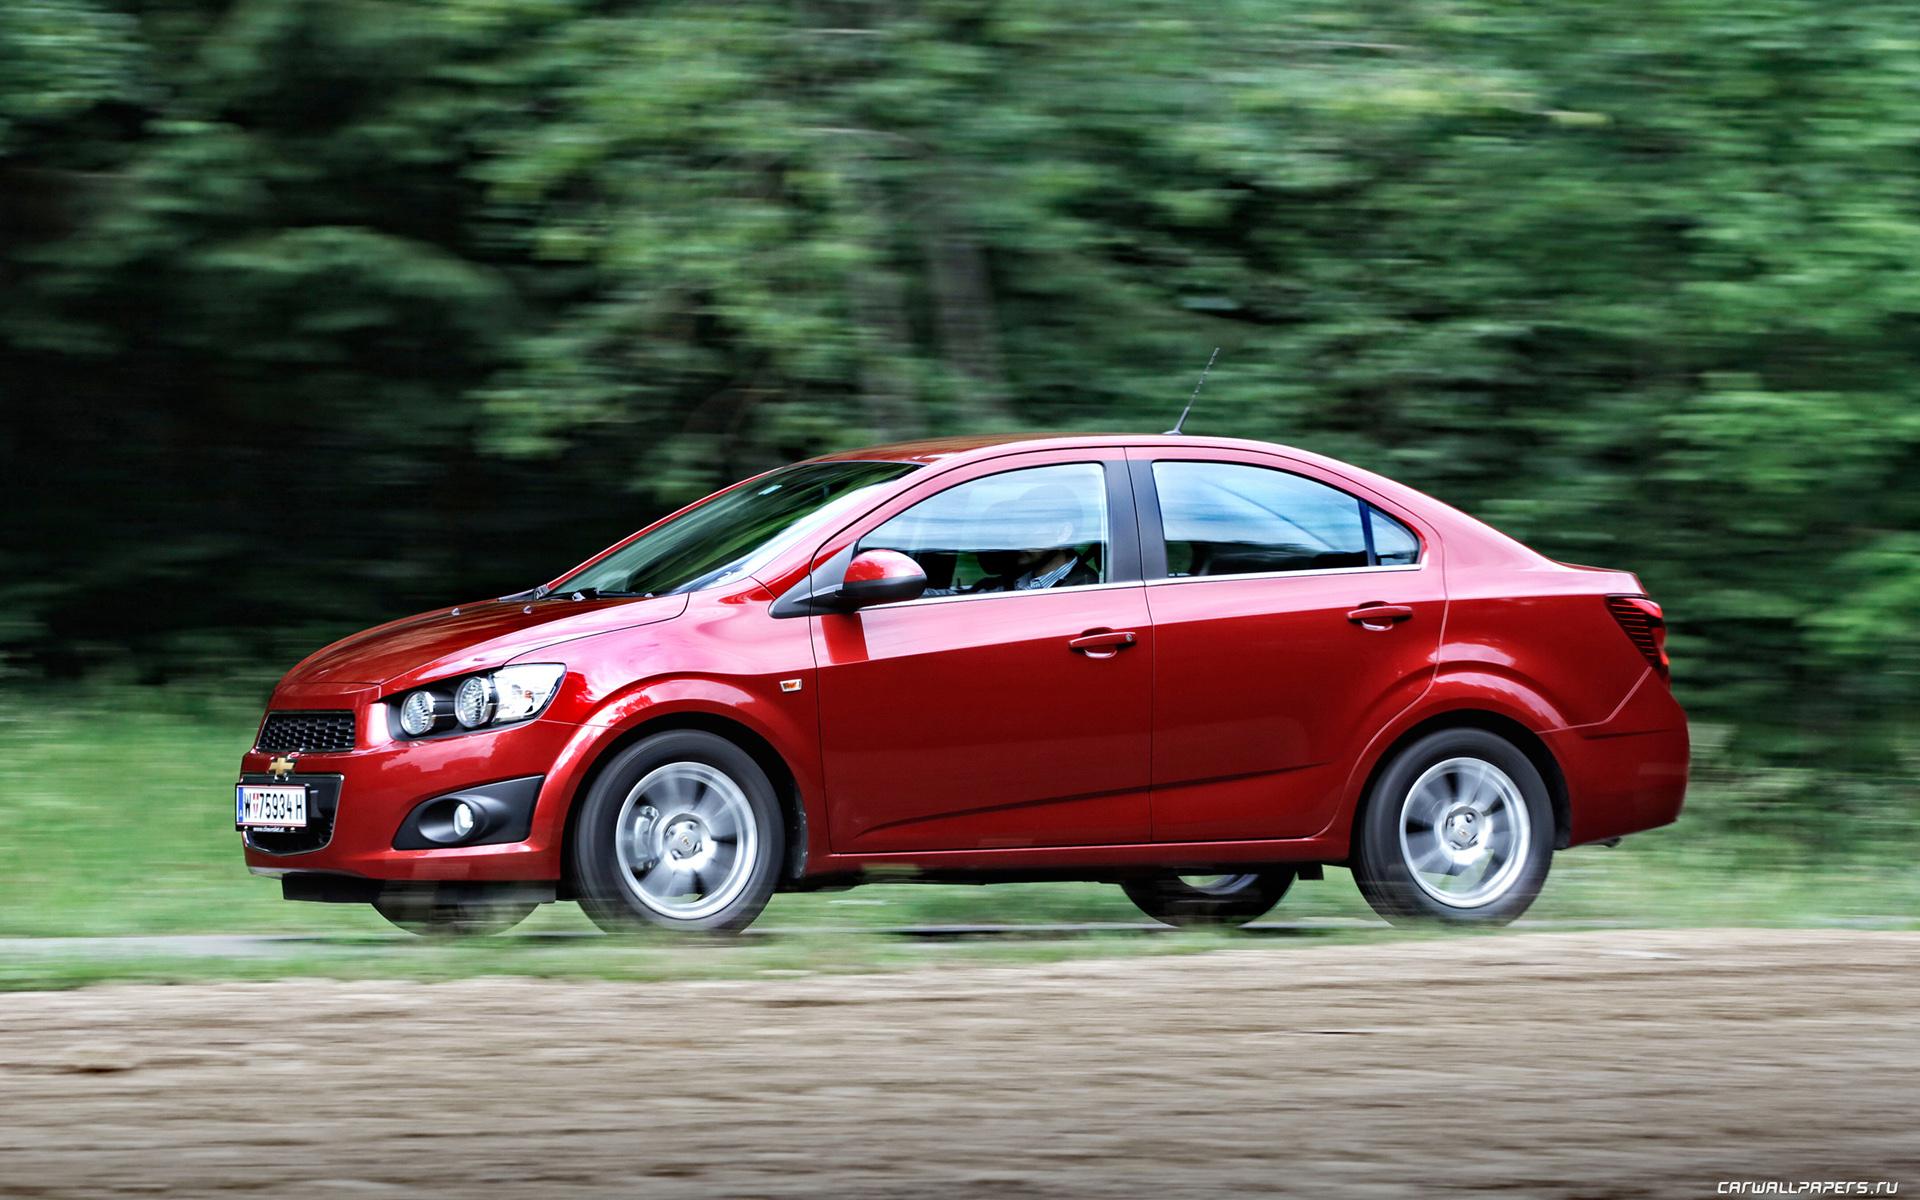 Chevrolet aveo new sedan фото